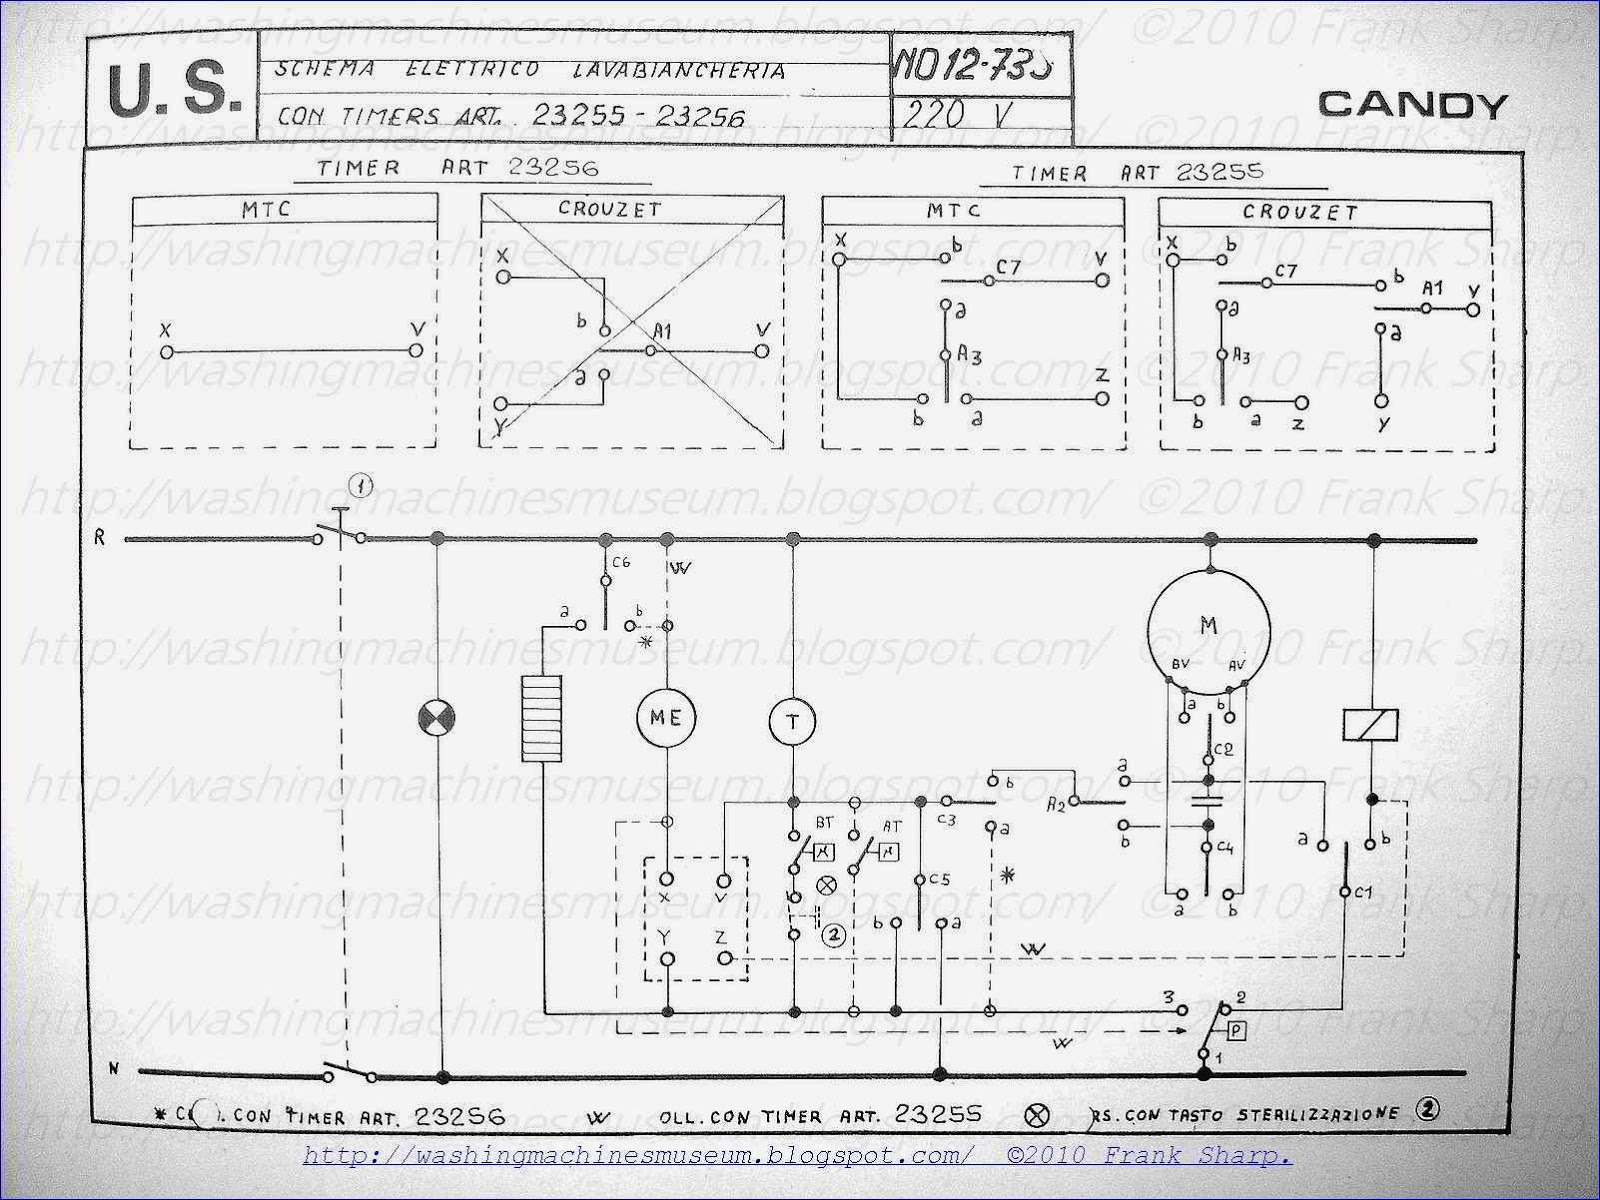 Cool maytag dishwasher wiring diagram contemporary electrical comfortable pye2300ayw maytag electric dryer wiring diagram images cheapraybanclubmaster Choice Image